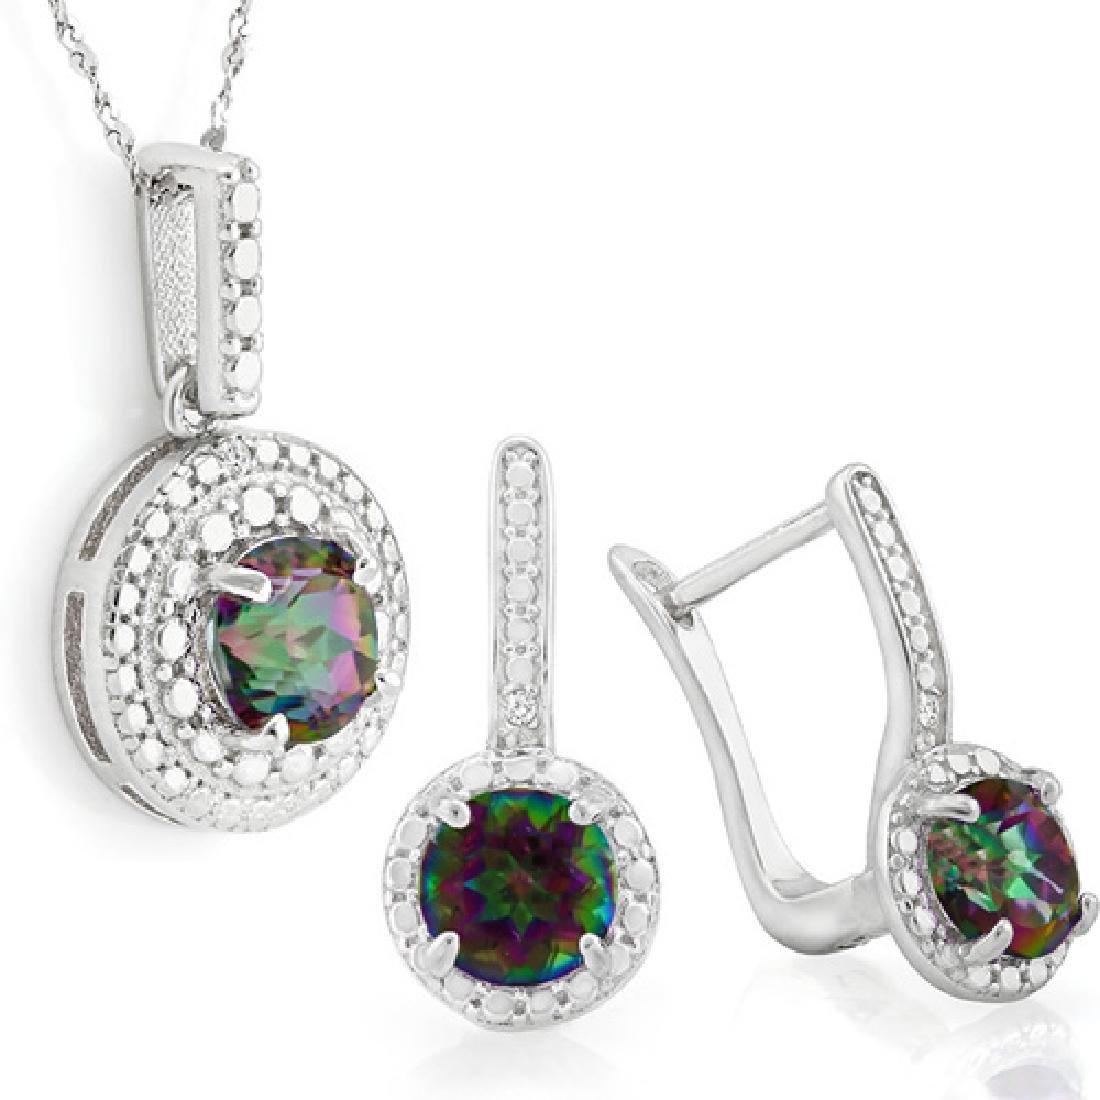 2 2/5 CARAT MYSTIC GEMSTONES & GENUINE DIAMONDS 925 STE